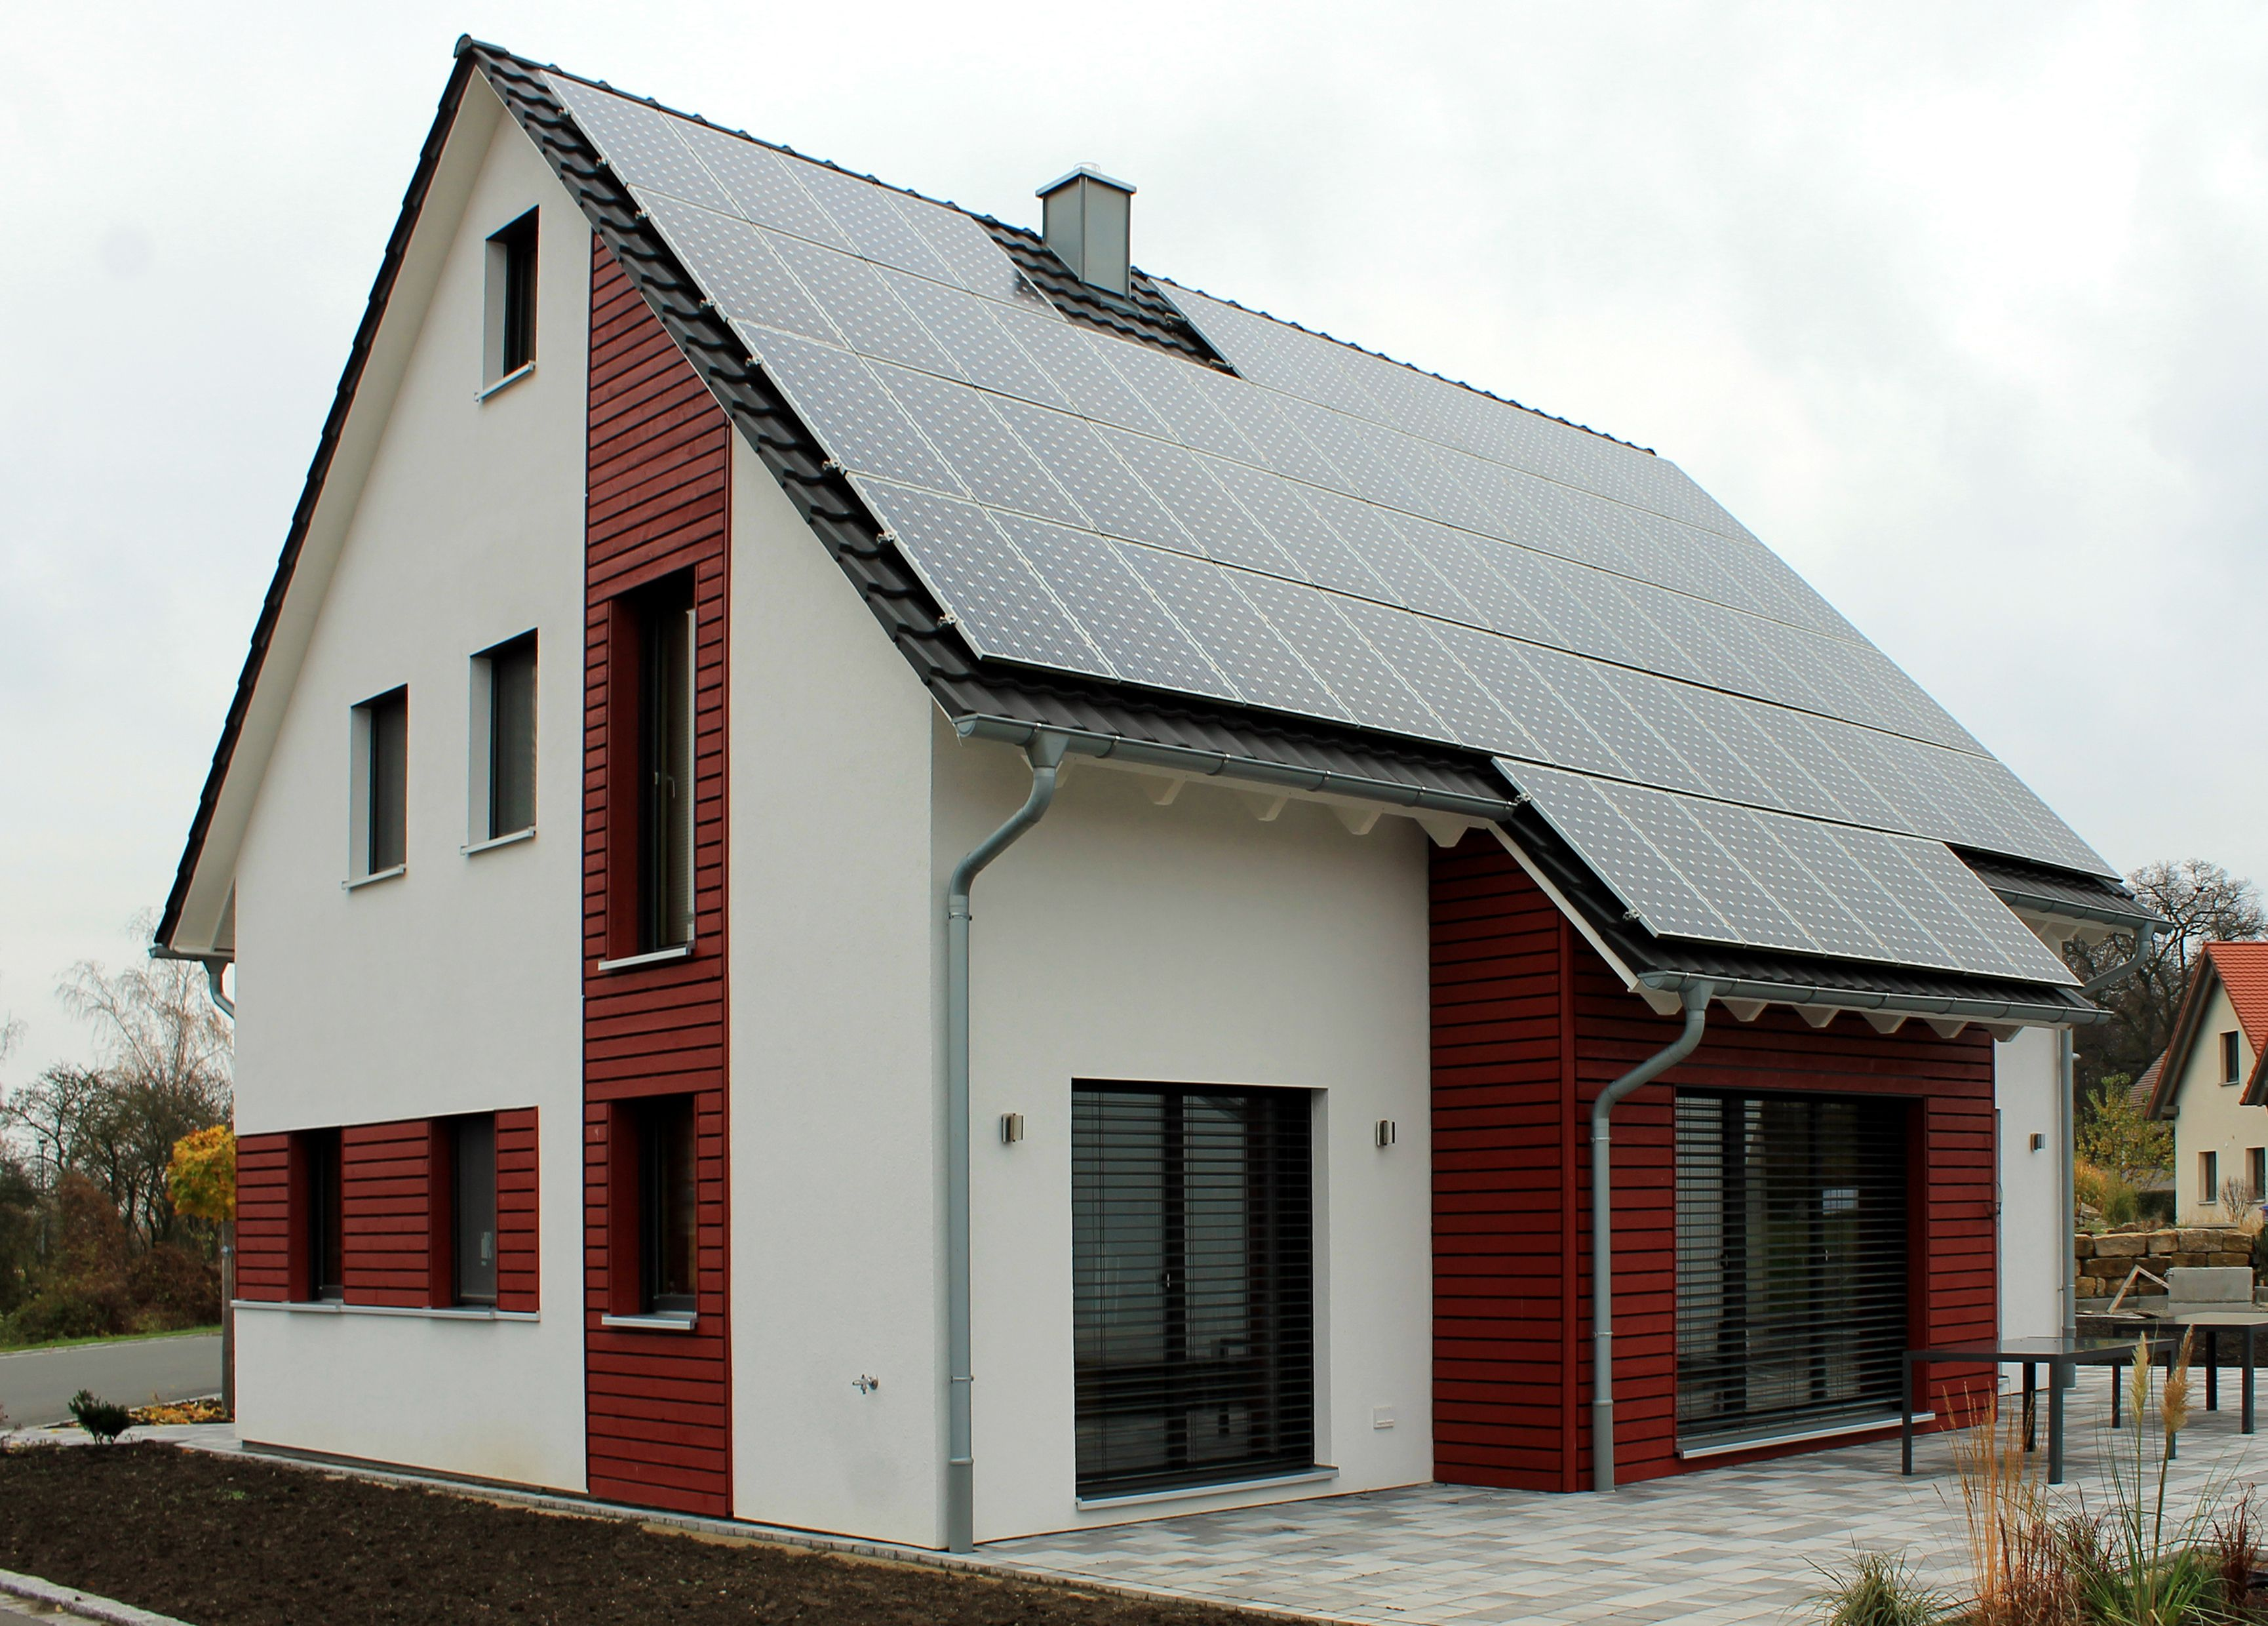 Cool Hausanbau Modern Decoration Of Holzfassade Satteldach Terrasse